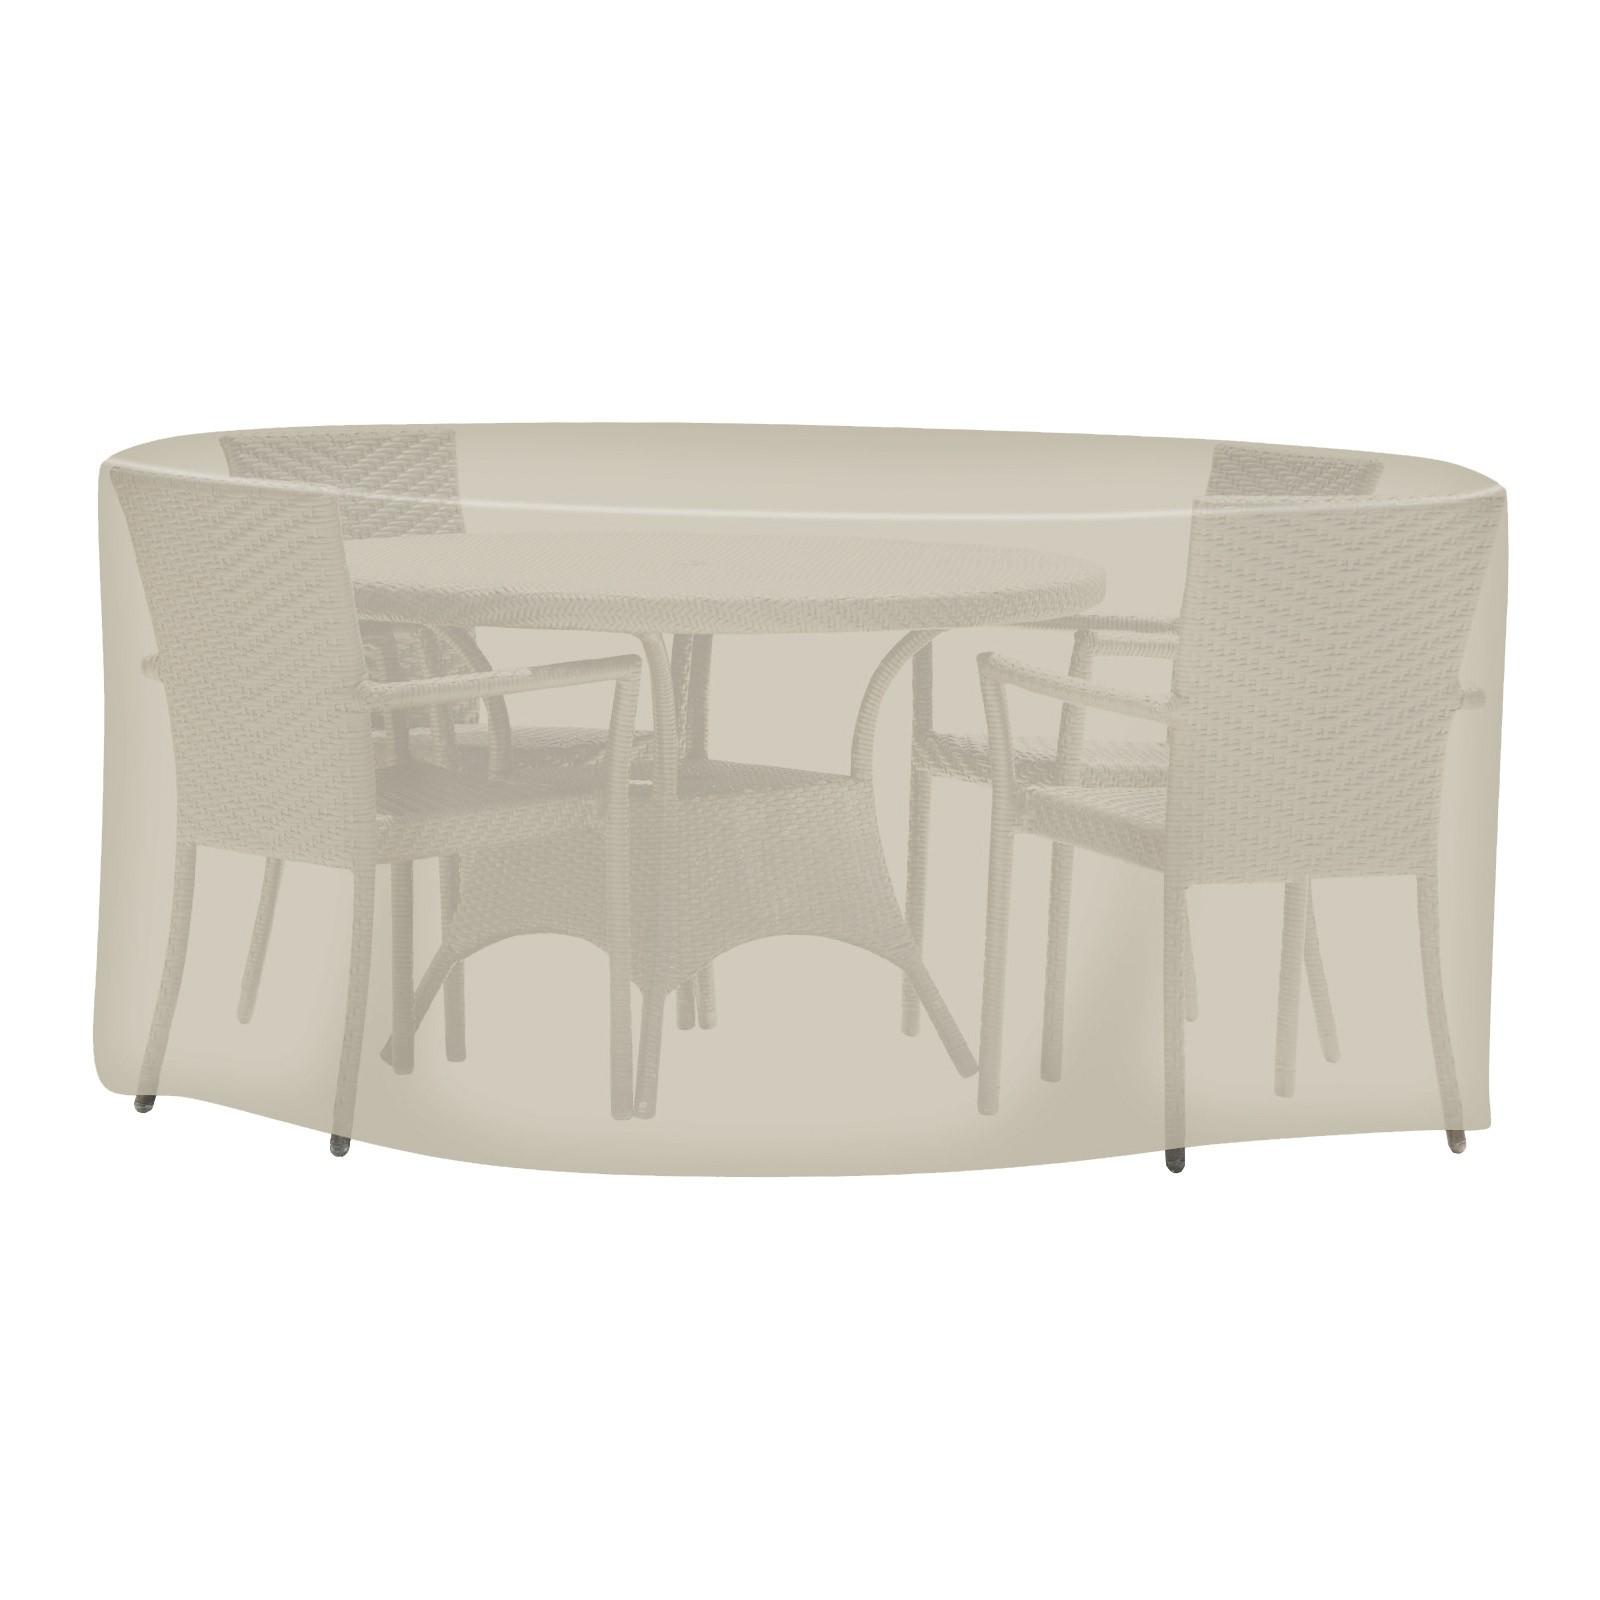 tepro universal abdeckhaube schutzplane regenschutz haube. Black Bedroom Furniture Sets. Home Design Ideas